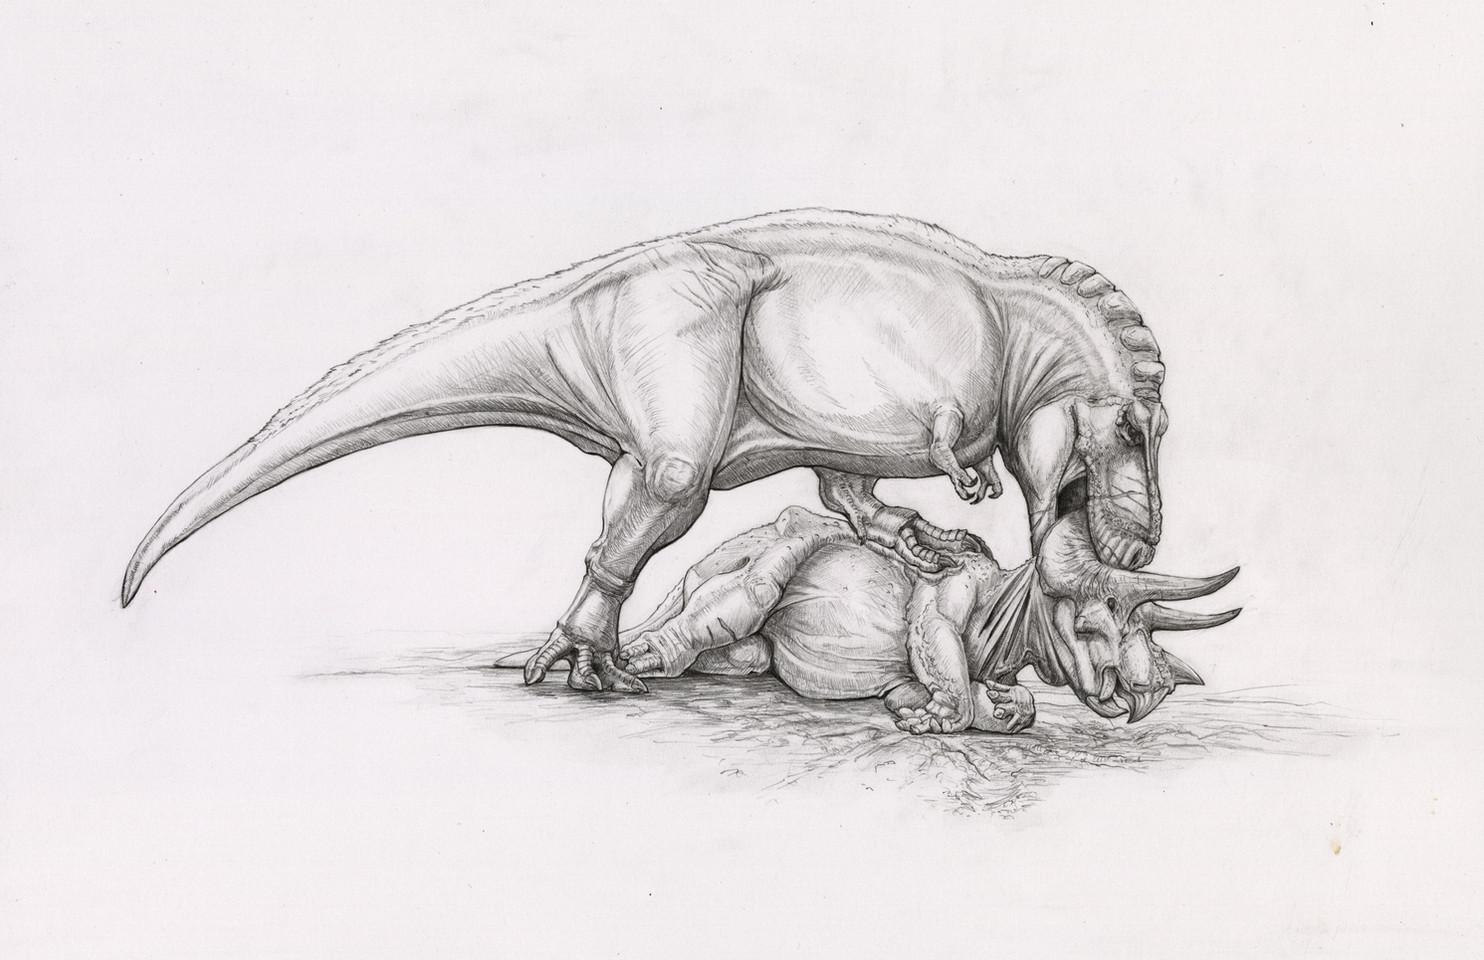 Feeding habits of T. rex